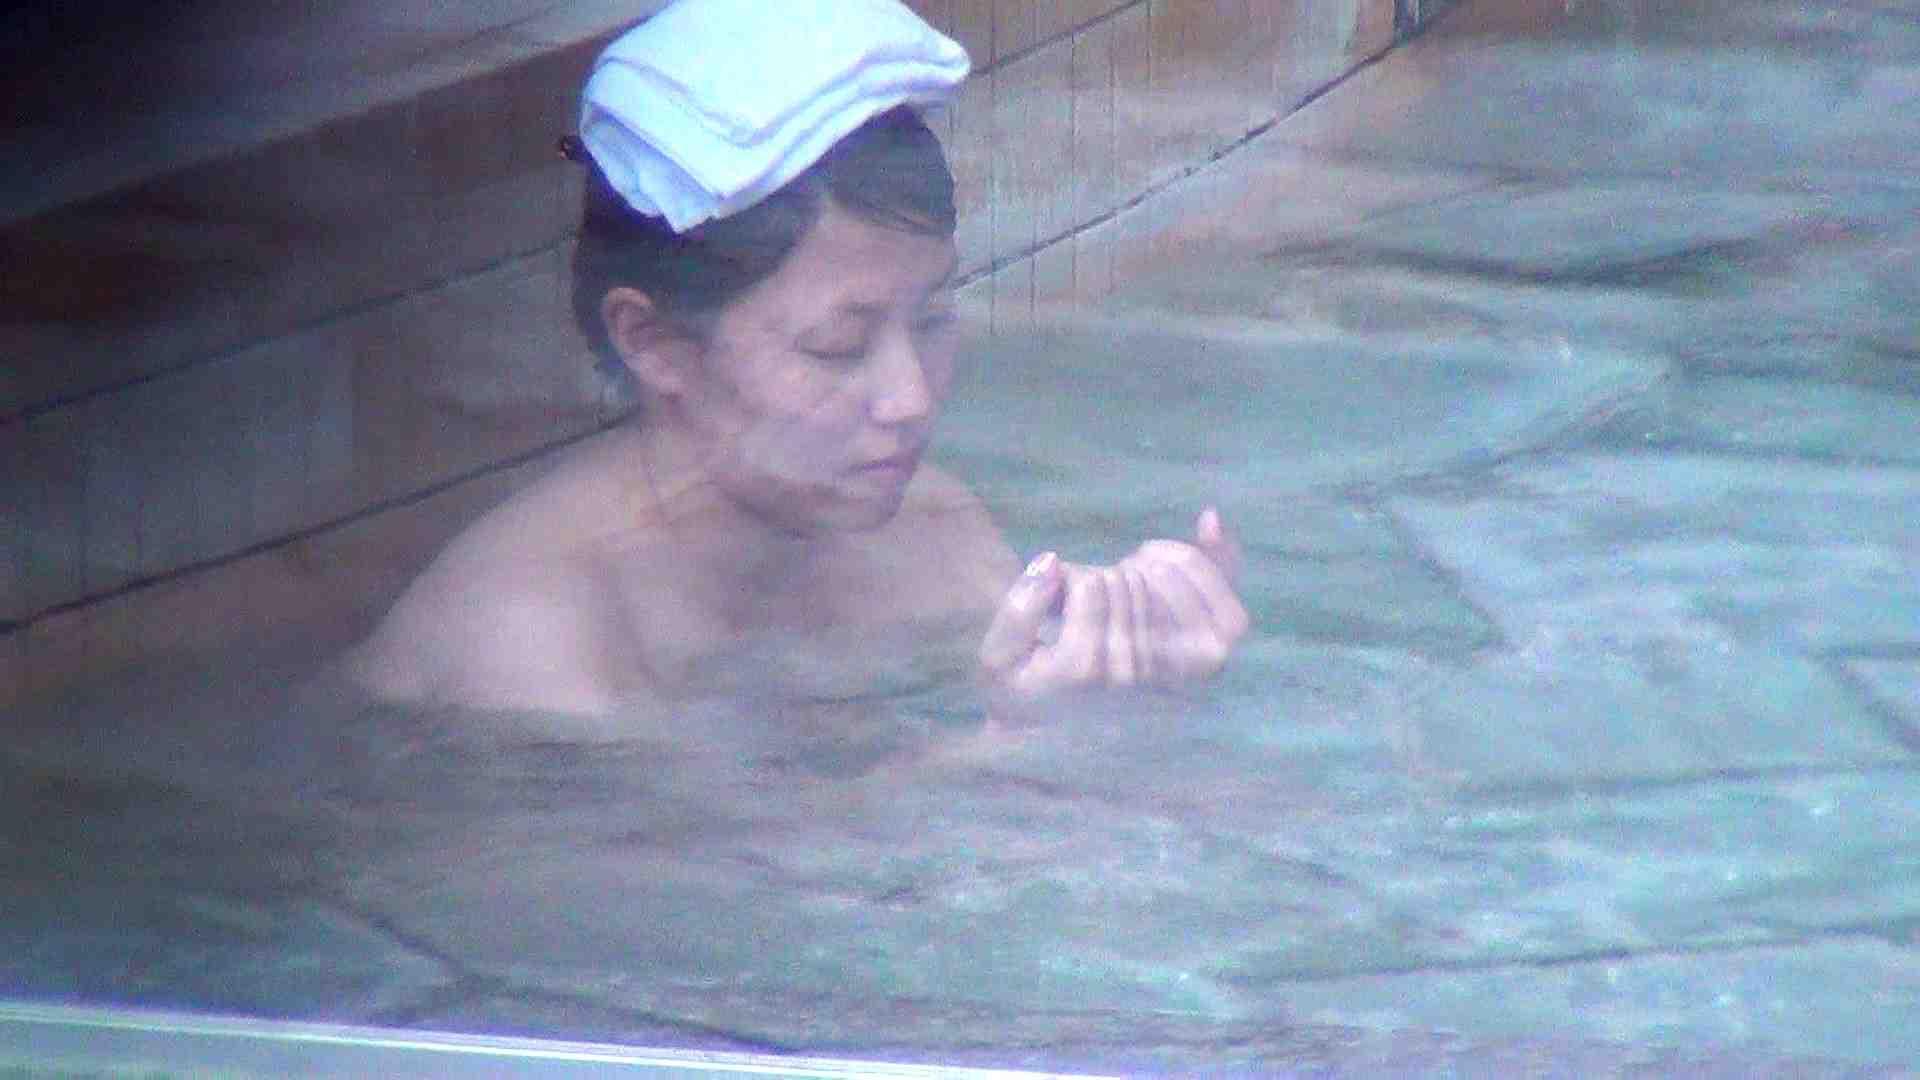 Aquaな露天風呂Vol.289 OLすけべ画像 AV無料 49連発 17